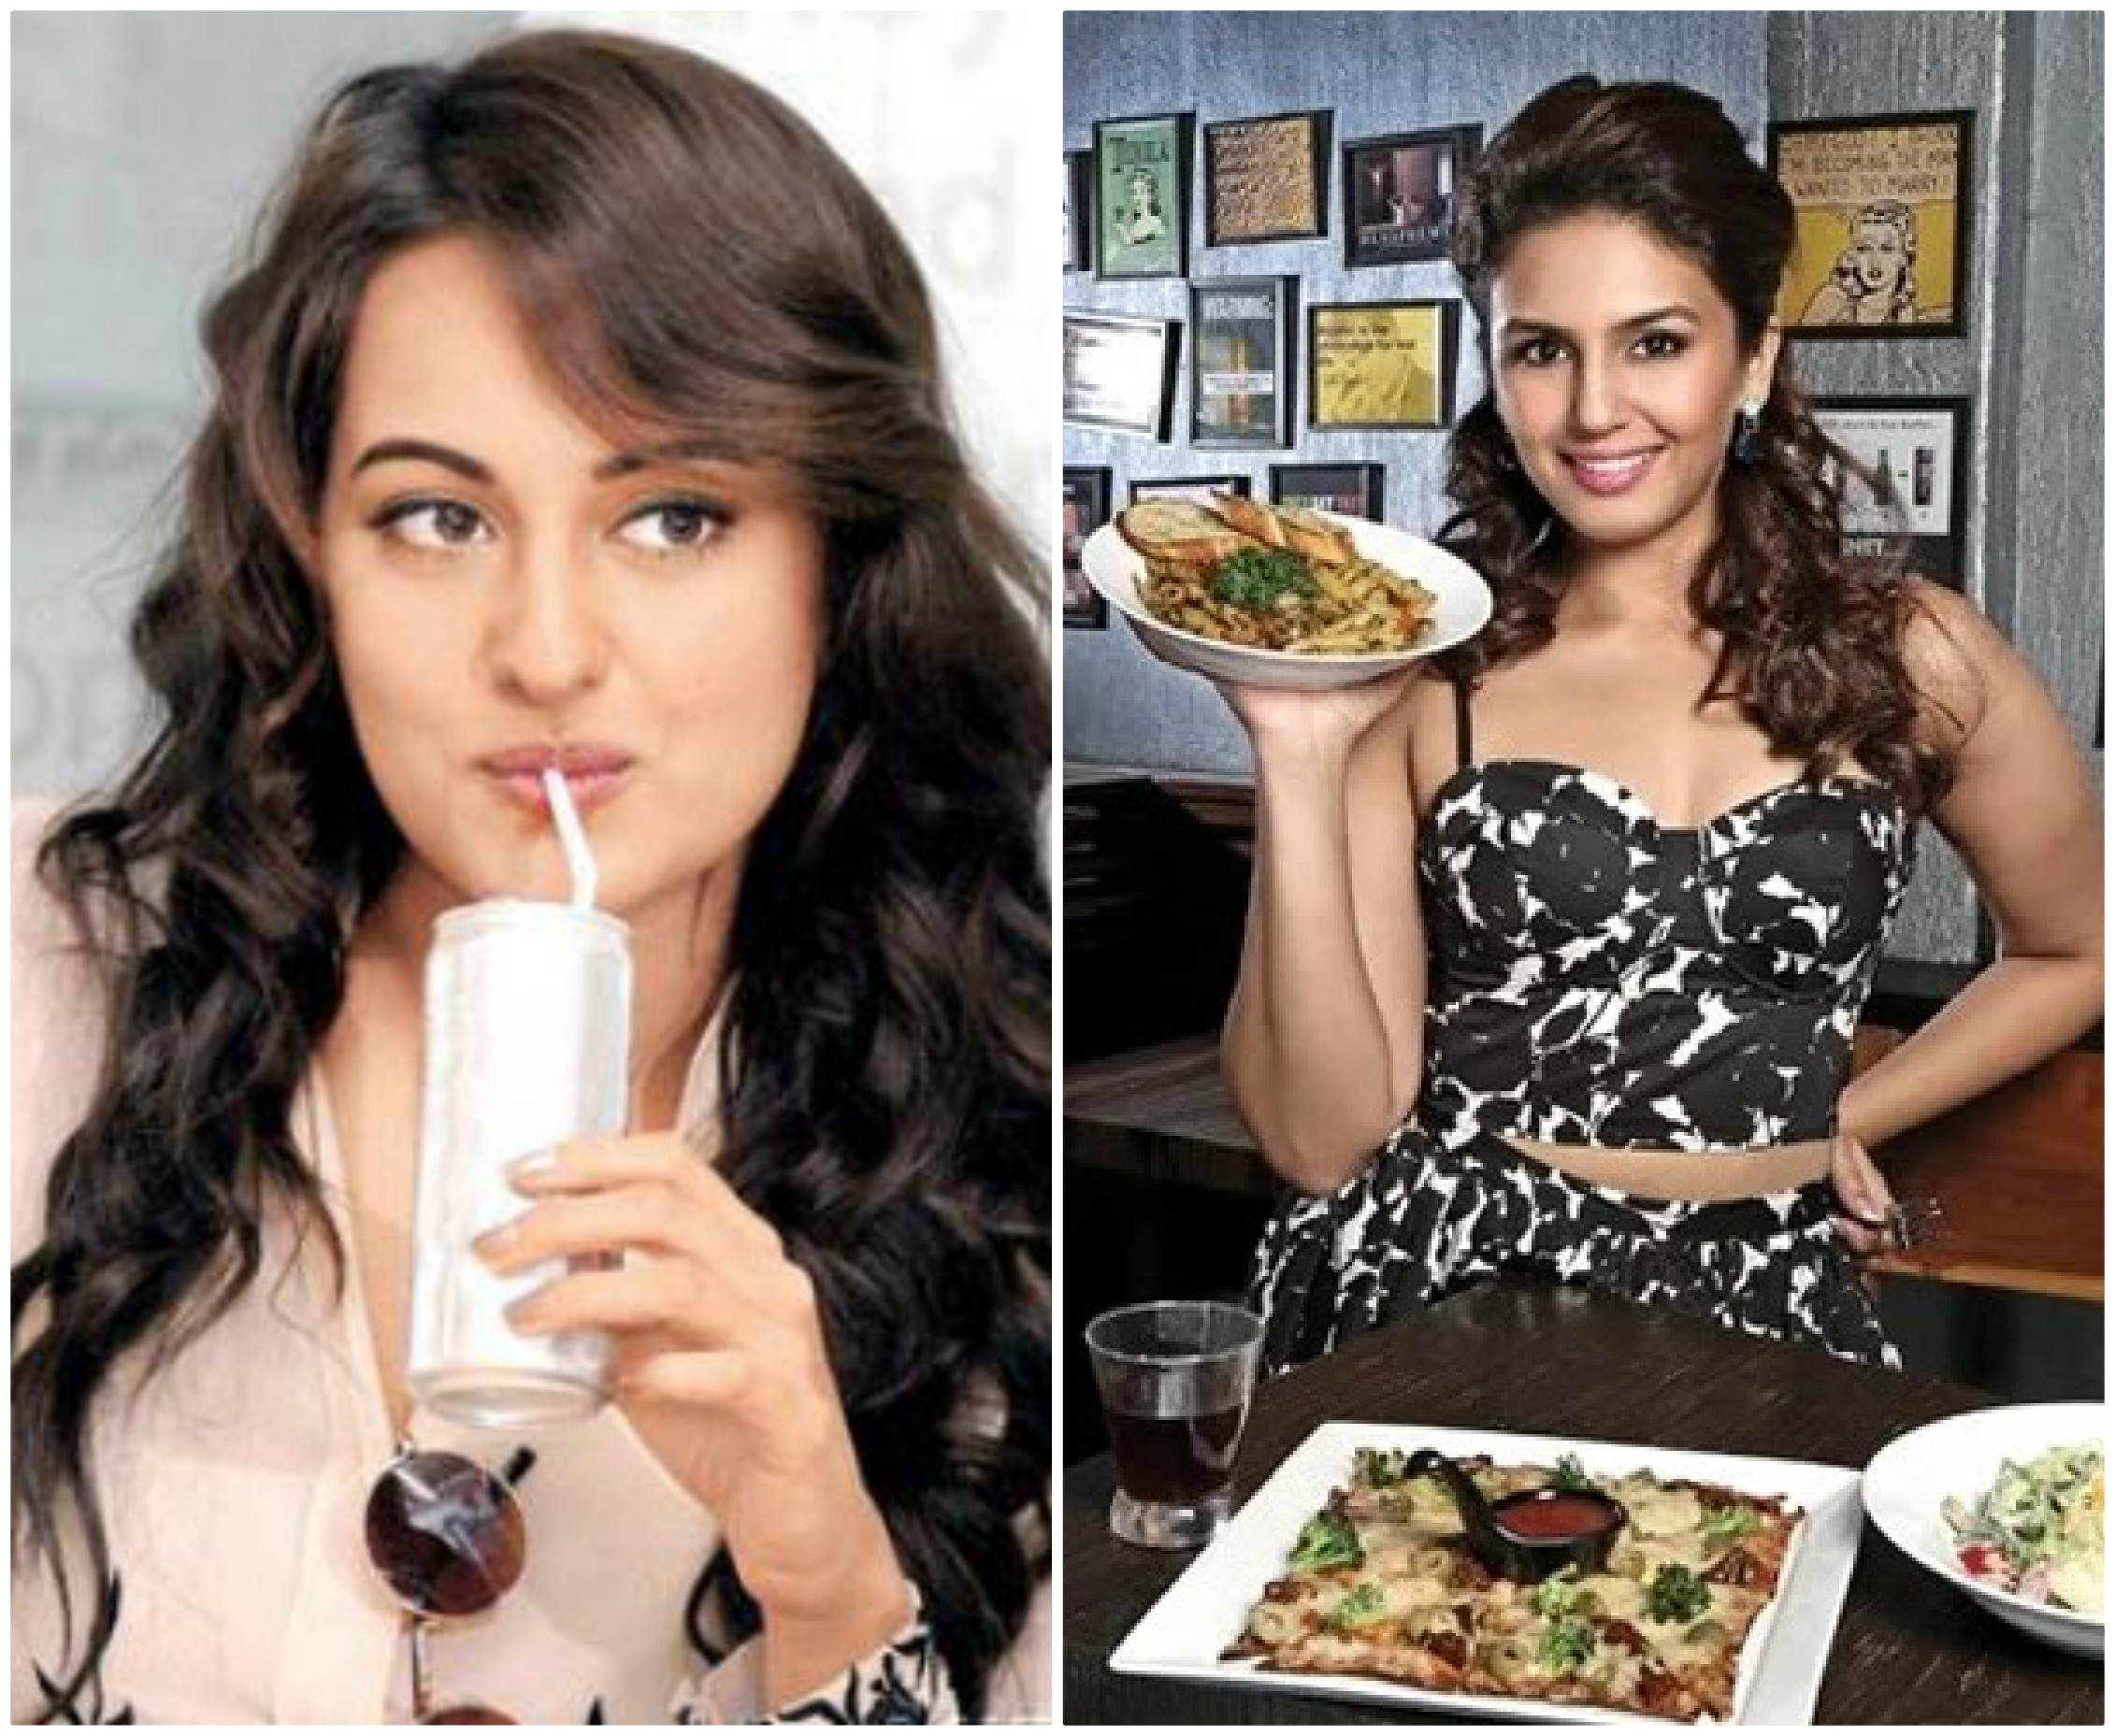 PunjabKesari, Keto Diet Image, Bollywood Actress On keto diet Image